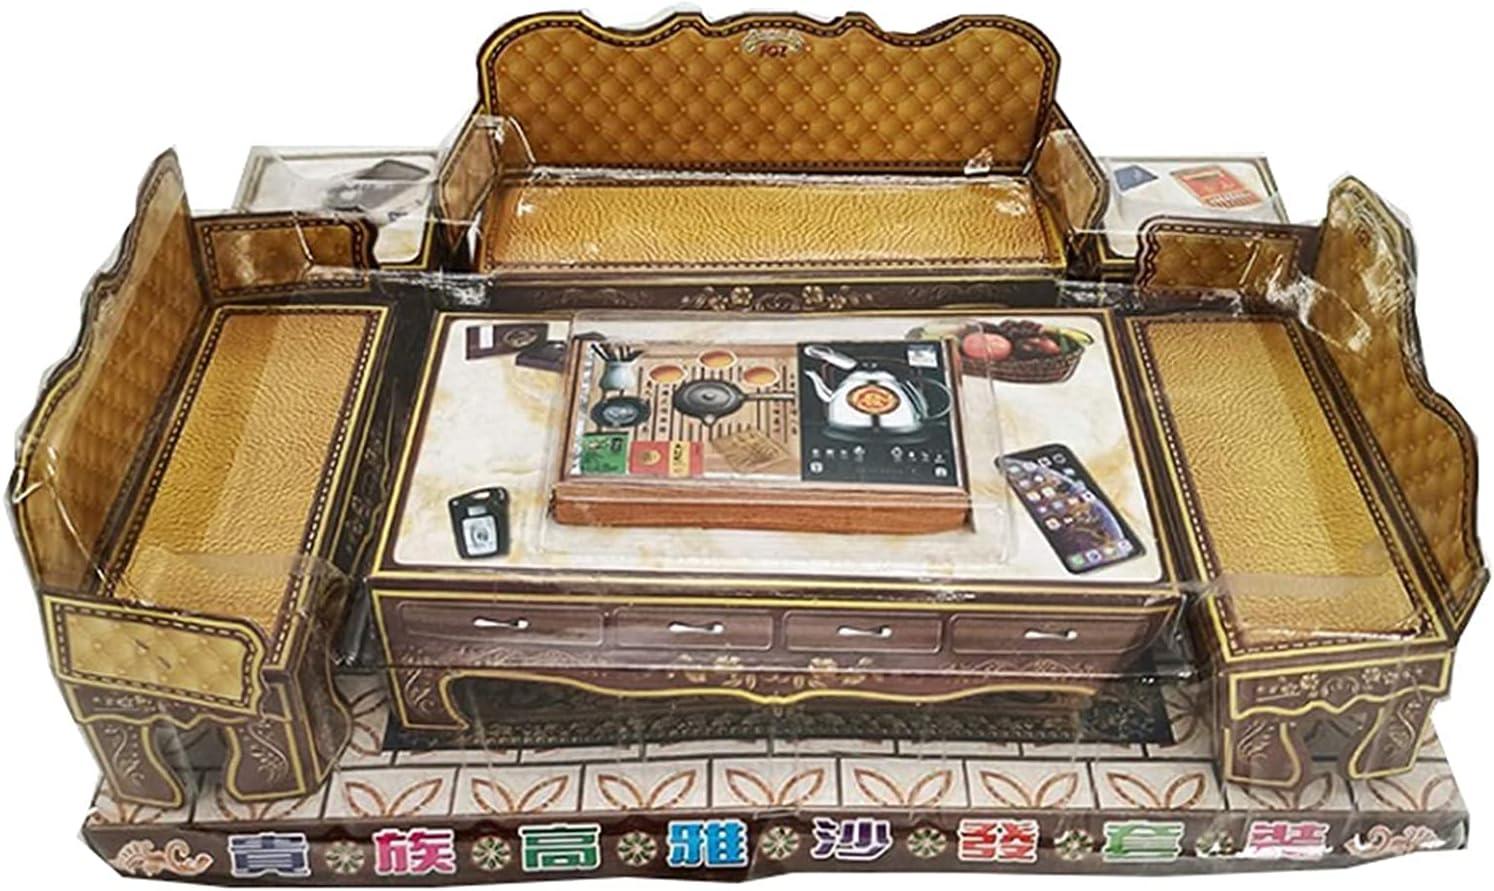 ZHANGQQ Ancestor Money Chinese Burning Max 87% OFF Money- Max 69% OFF offerings